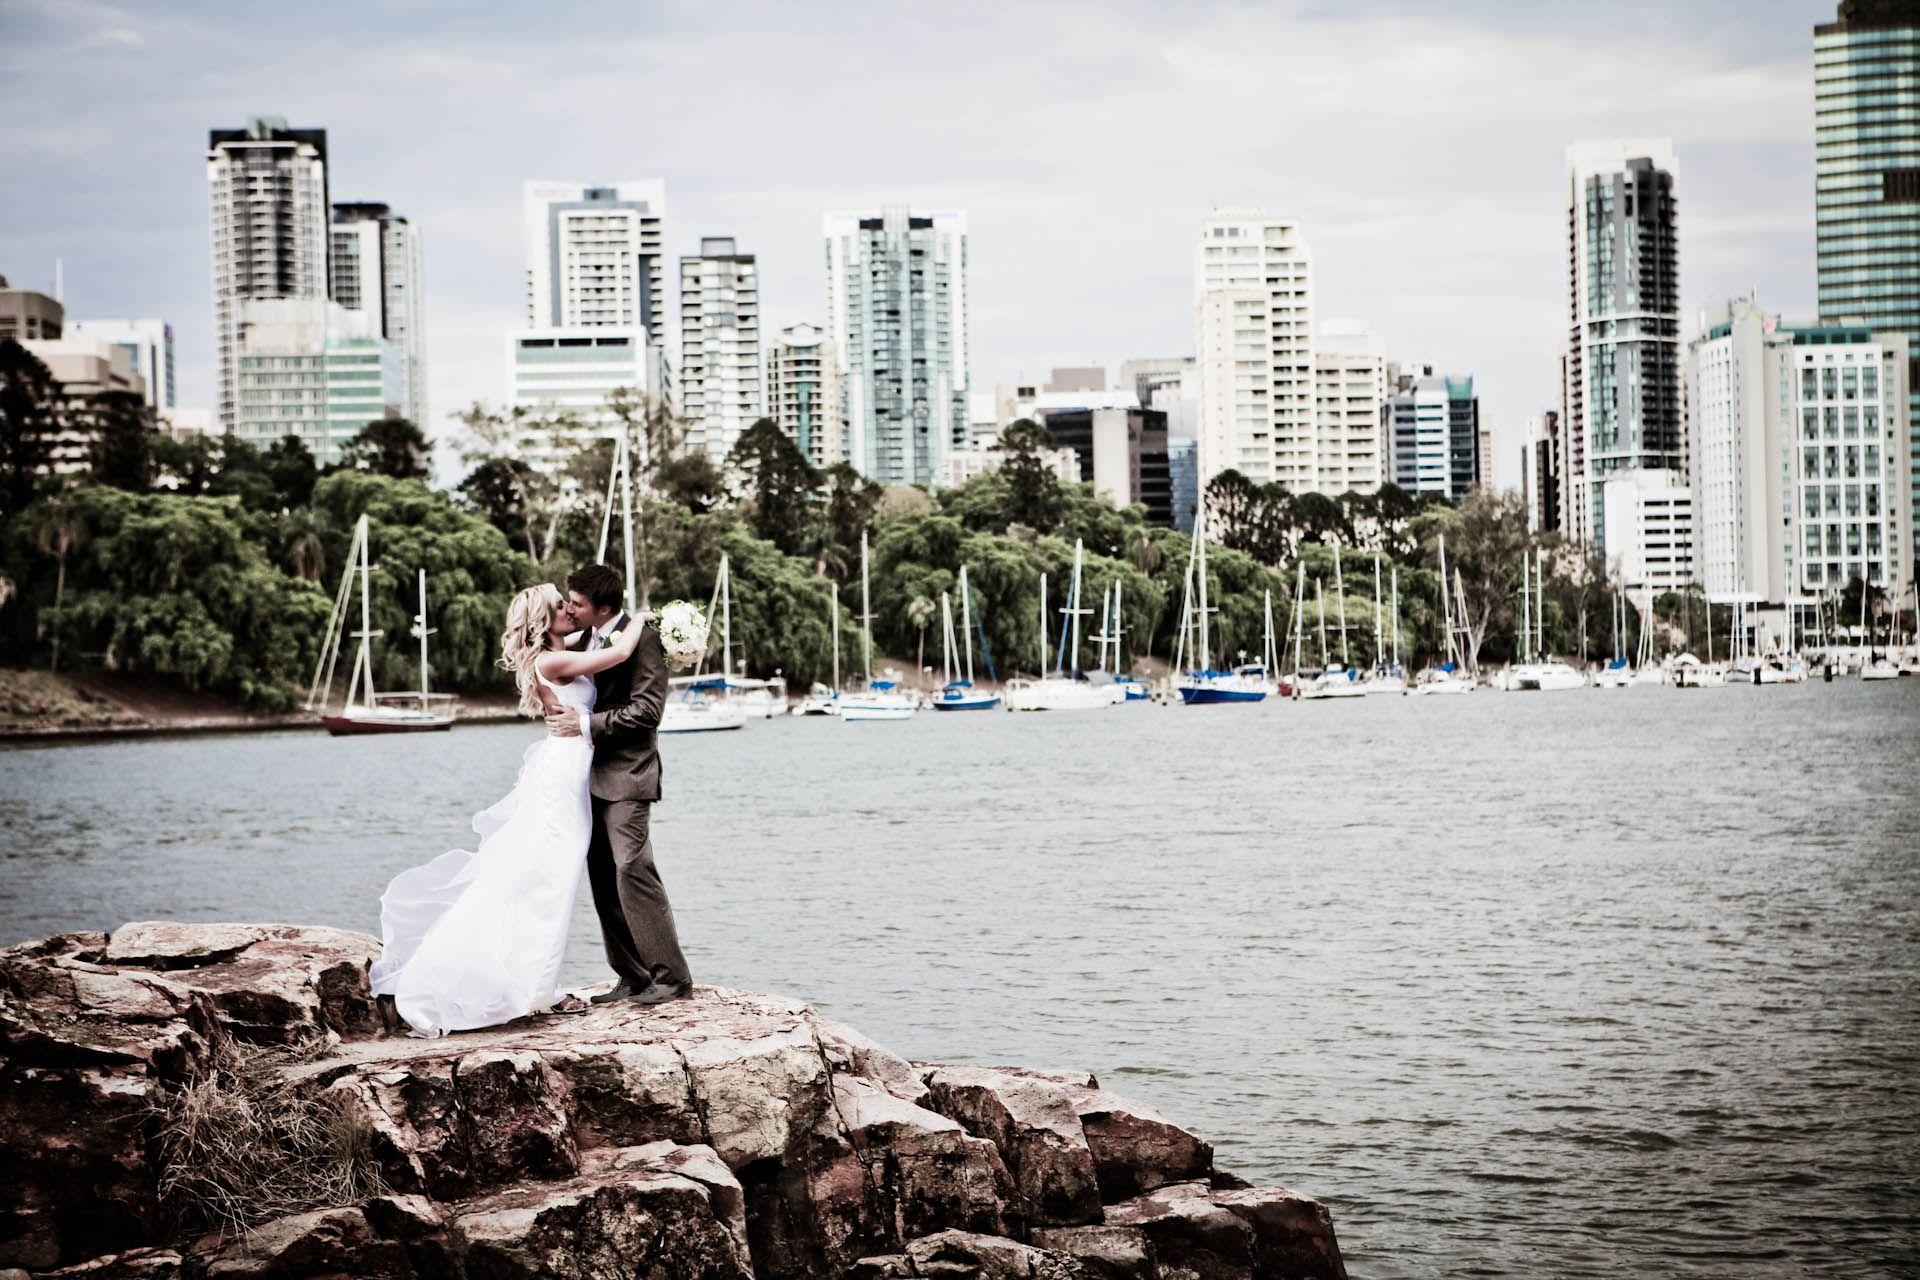 Wedding decorations at church november 2018 Anna and Richard  Fabulous Photography  Pinterest  Gold coast and